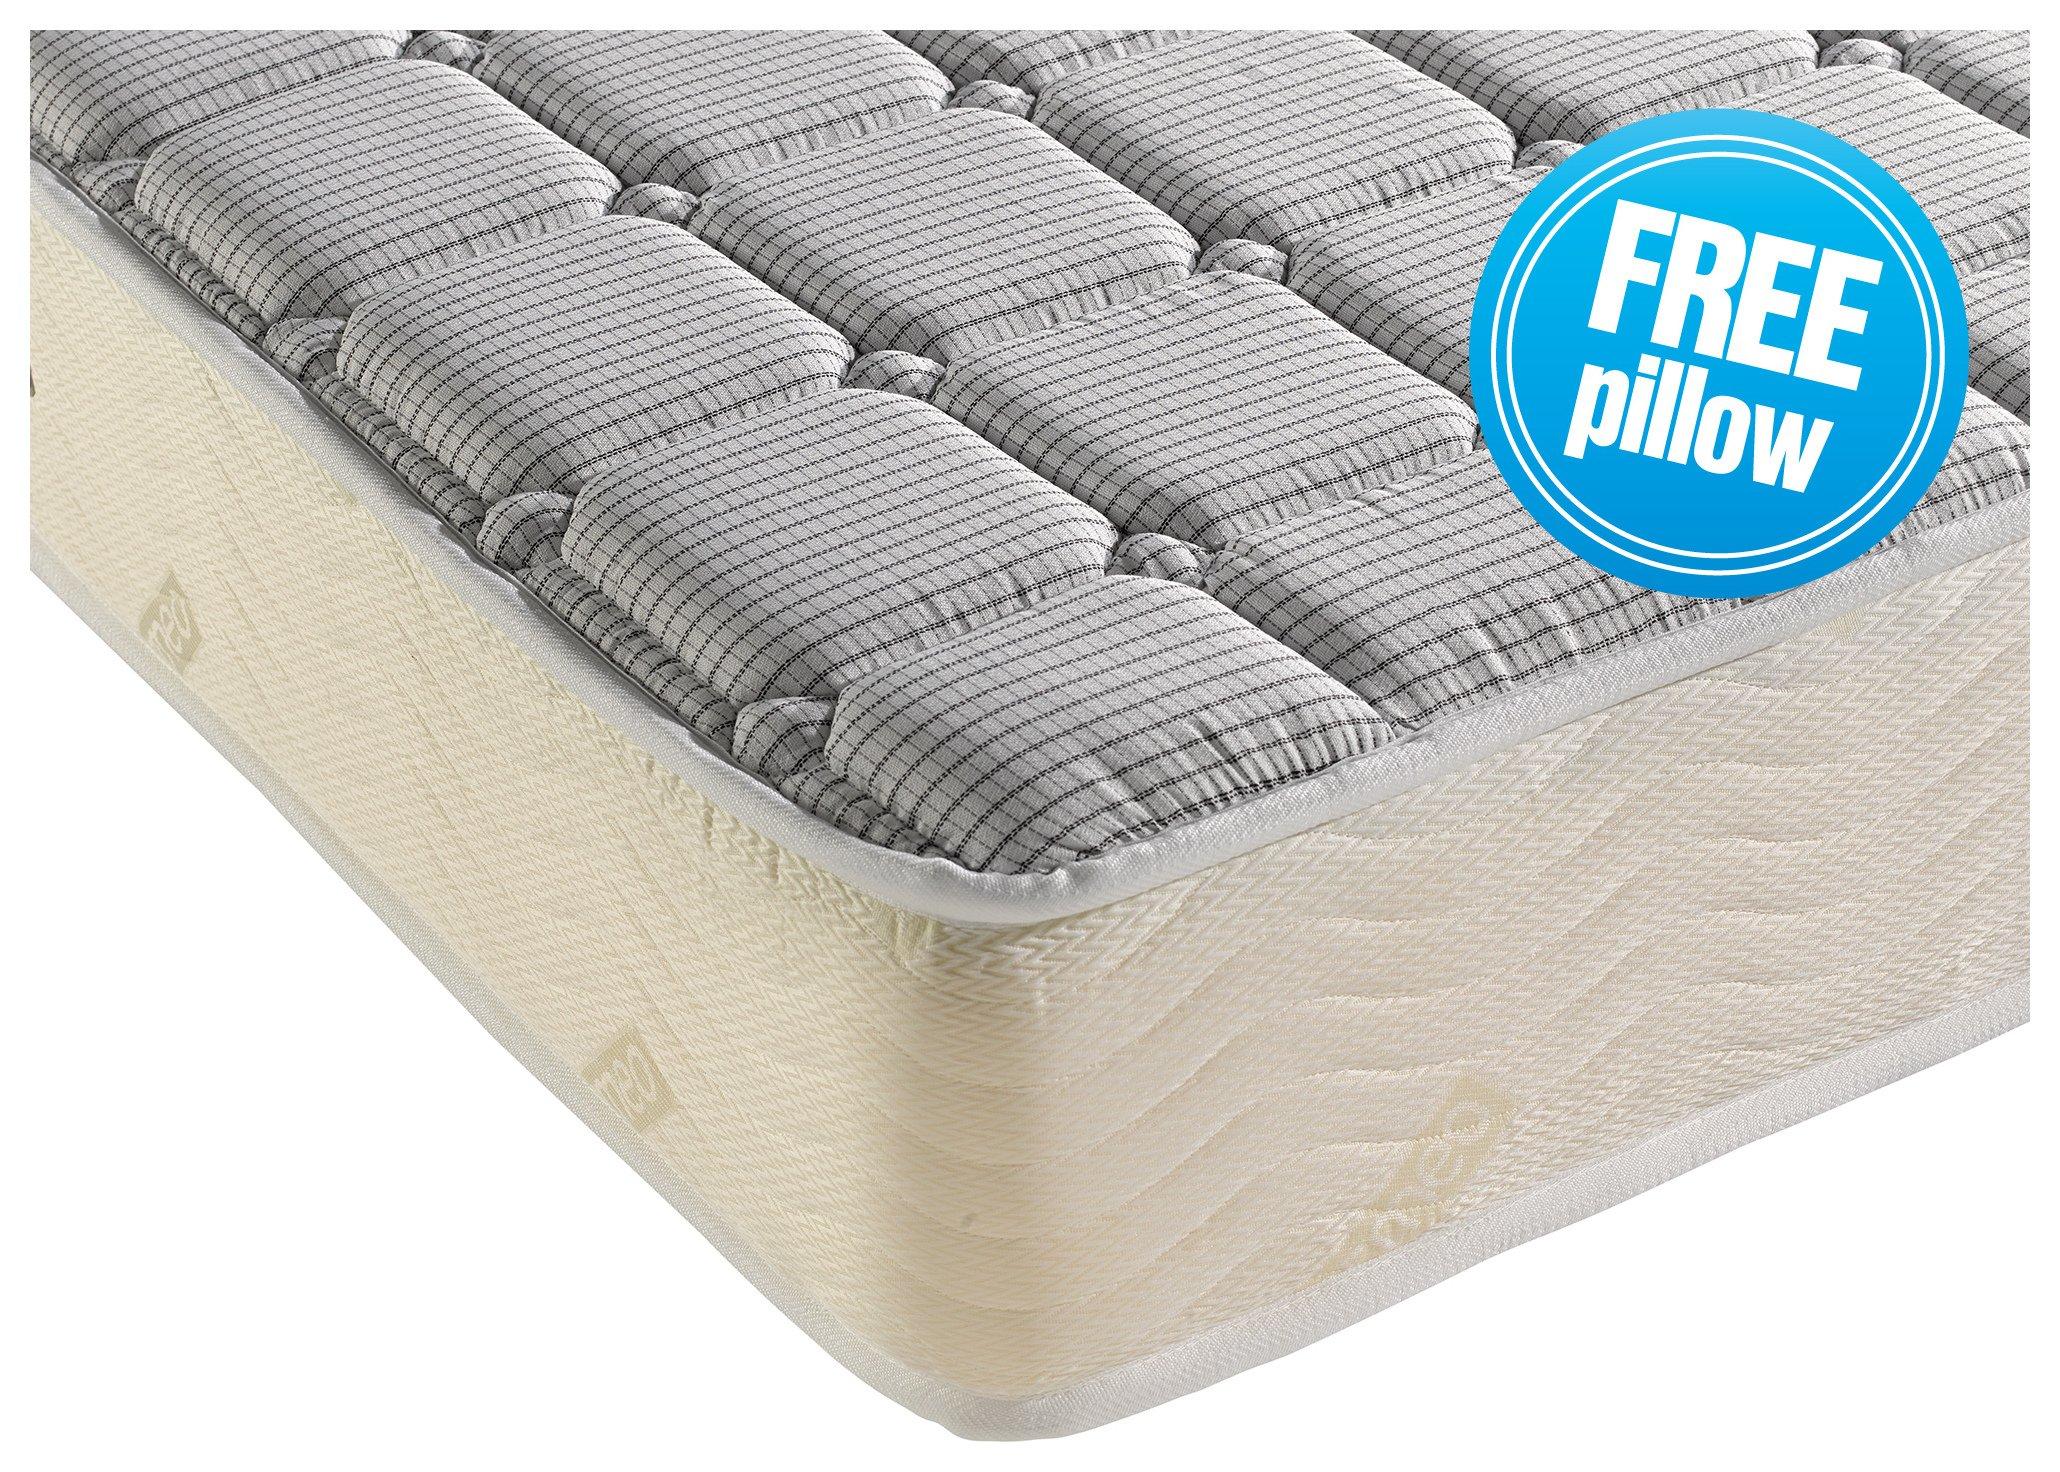 Image of Dormeo Deluxe Memory Foam Superking Mattress